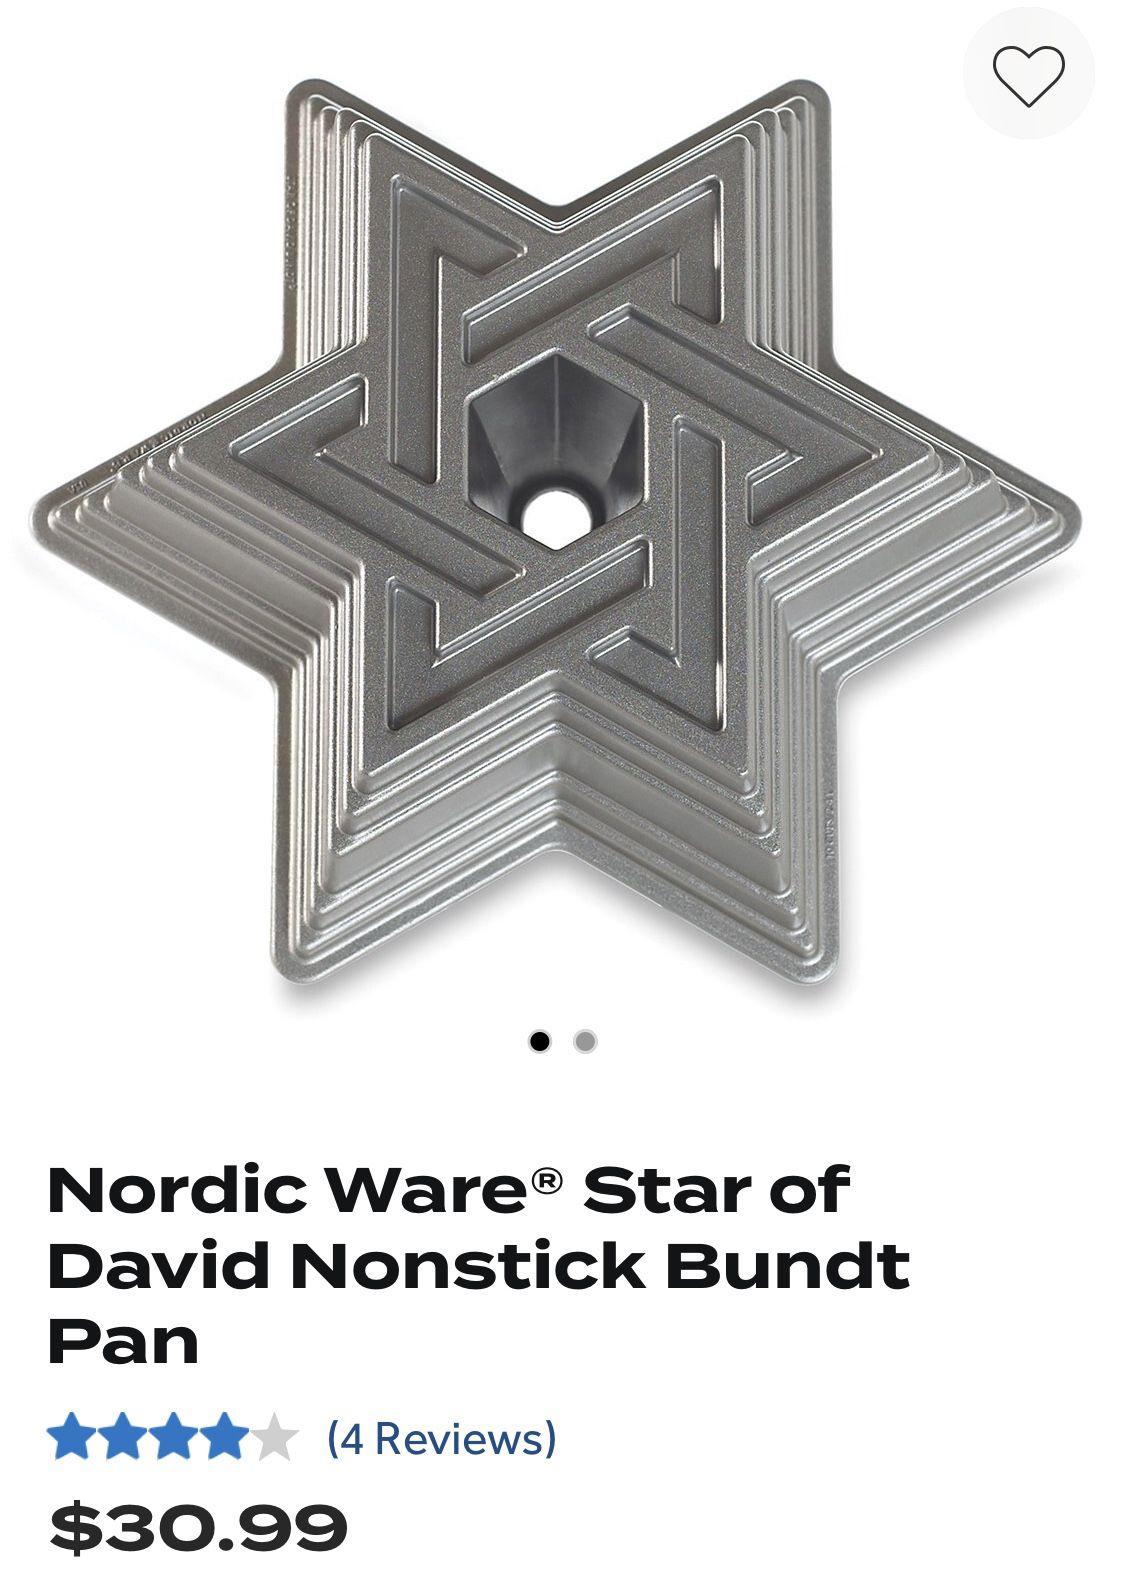 Star of David Bundt Pan